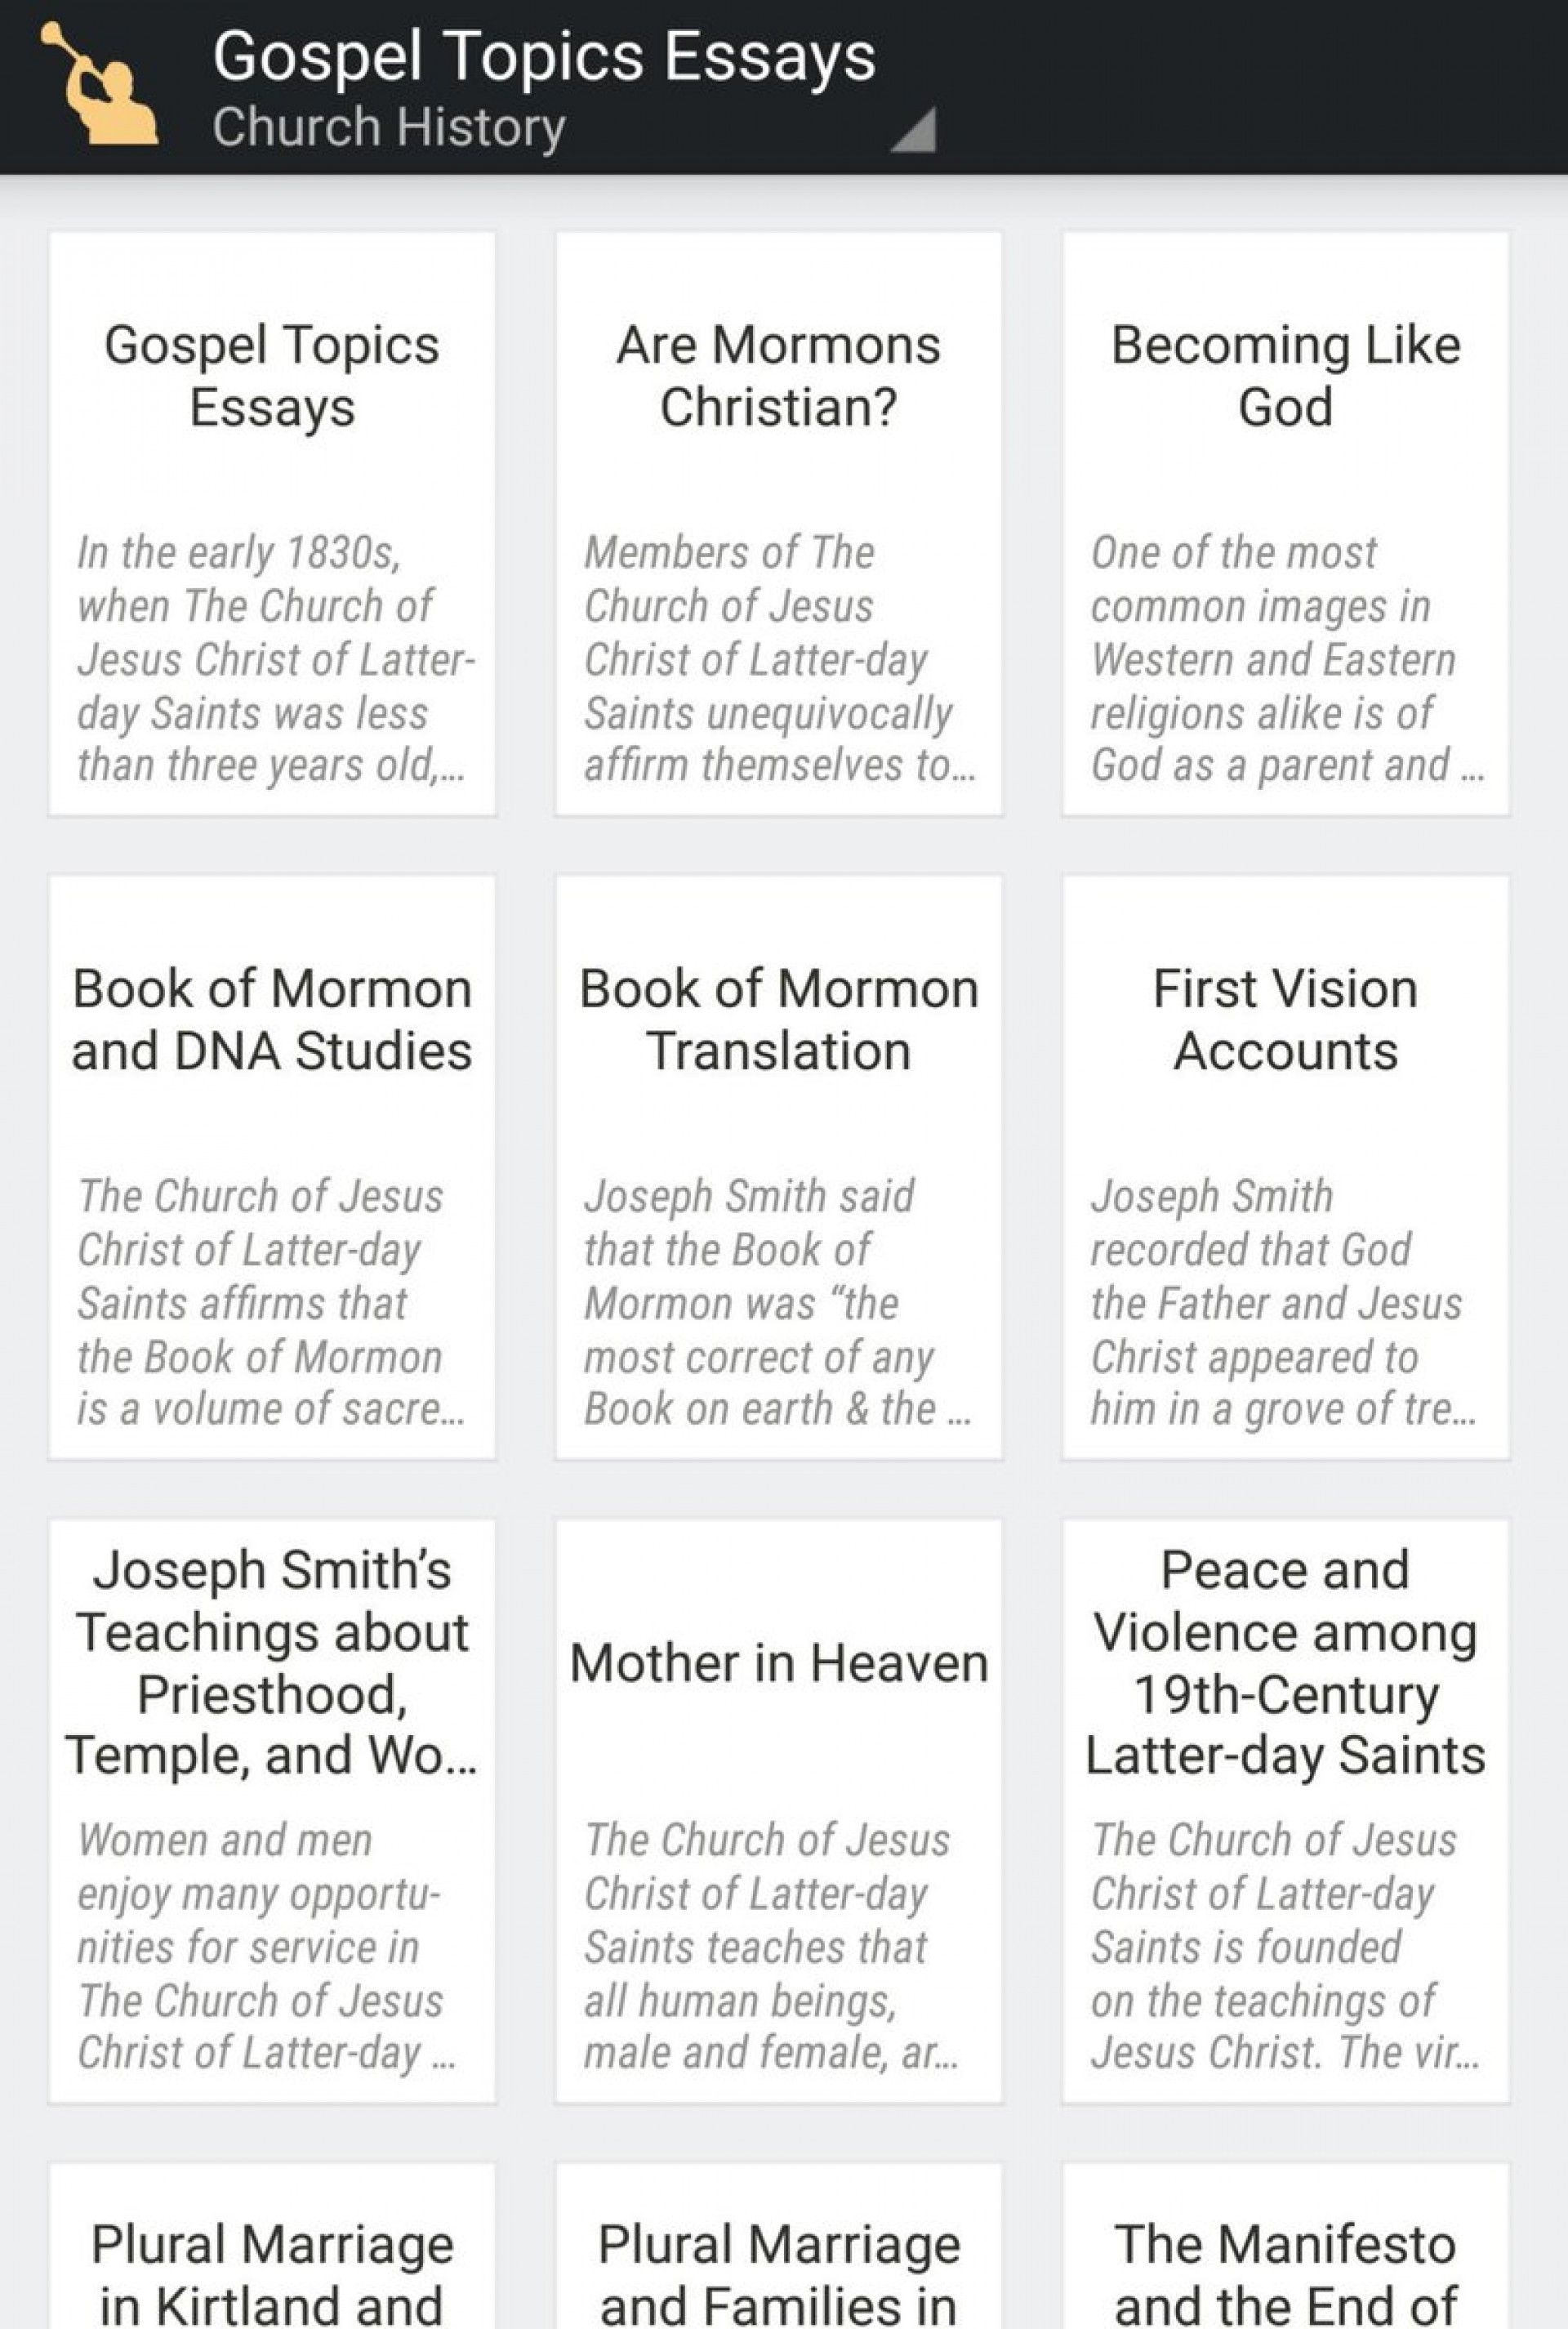 013 Gospel Topics Essays Chjy Kbveaadaux Essay Outstanding Pdf Plural Marriage Becoming Like God 1920